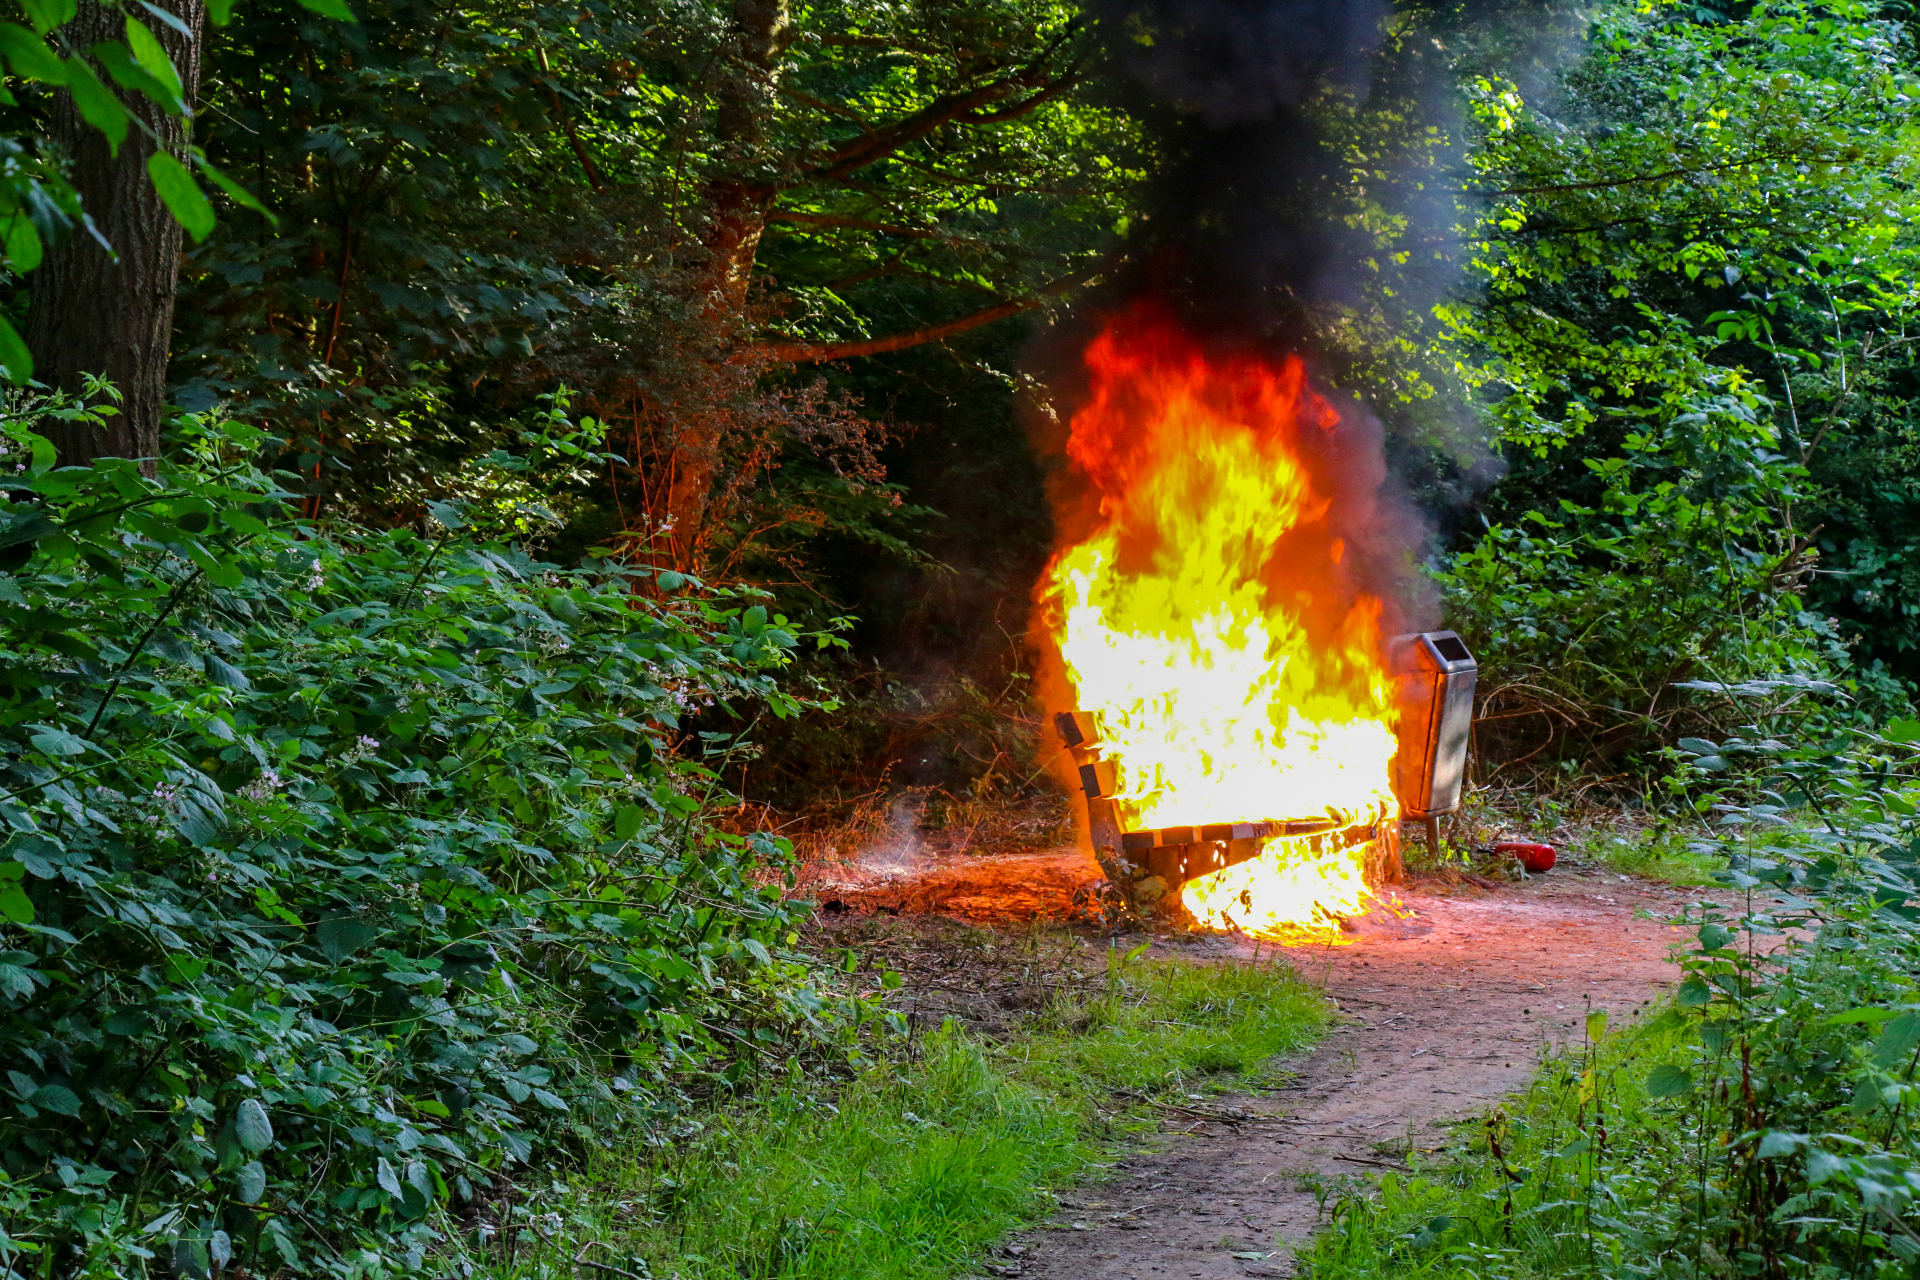 Vlammen zee nadat bankje in brand wordt gezet in Zutphen